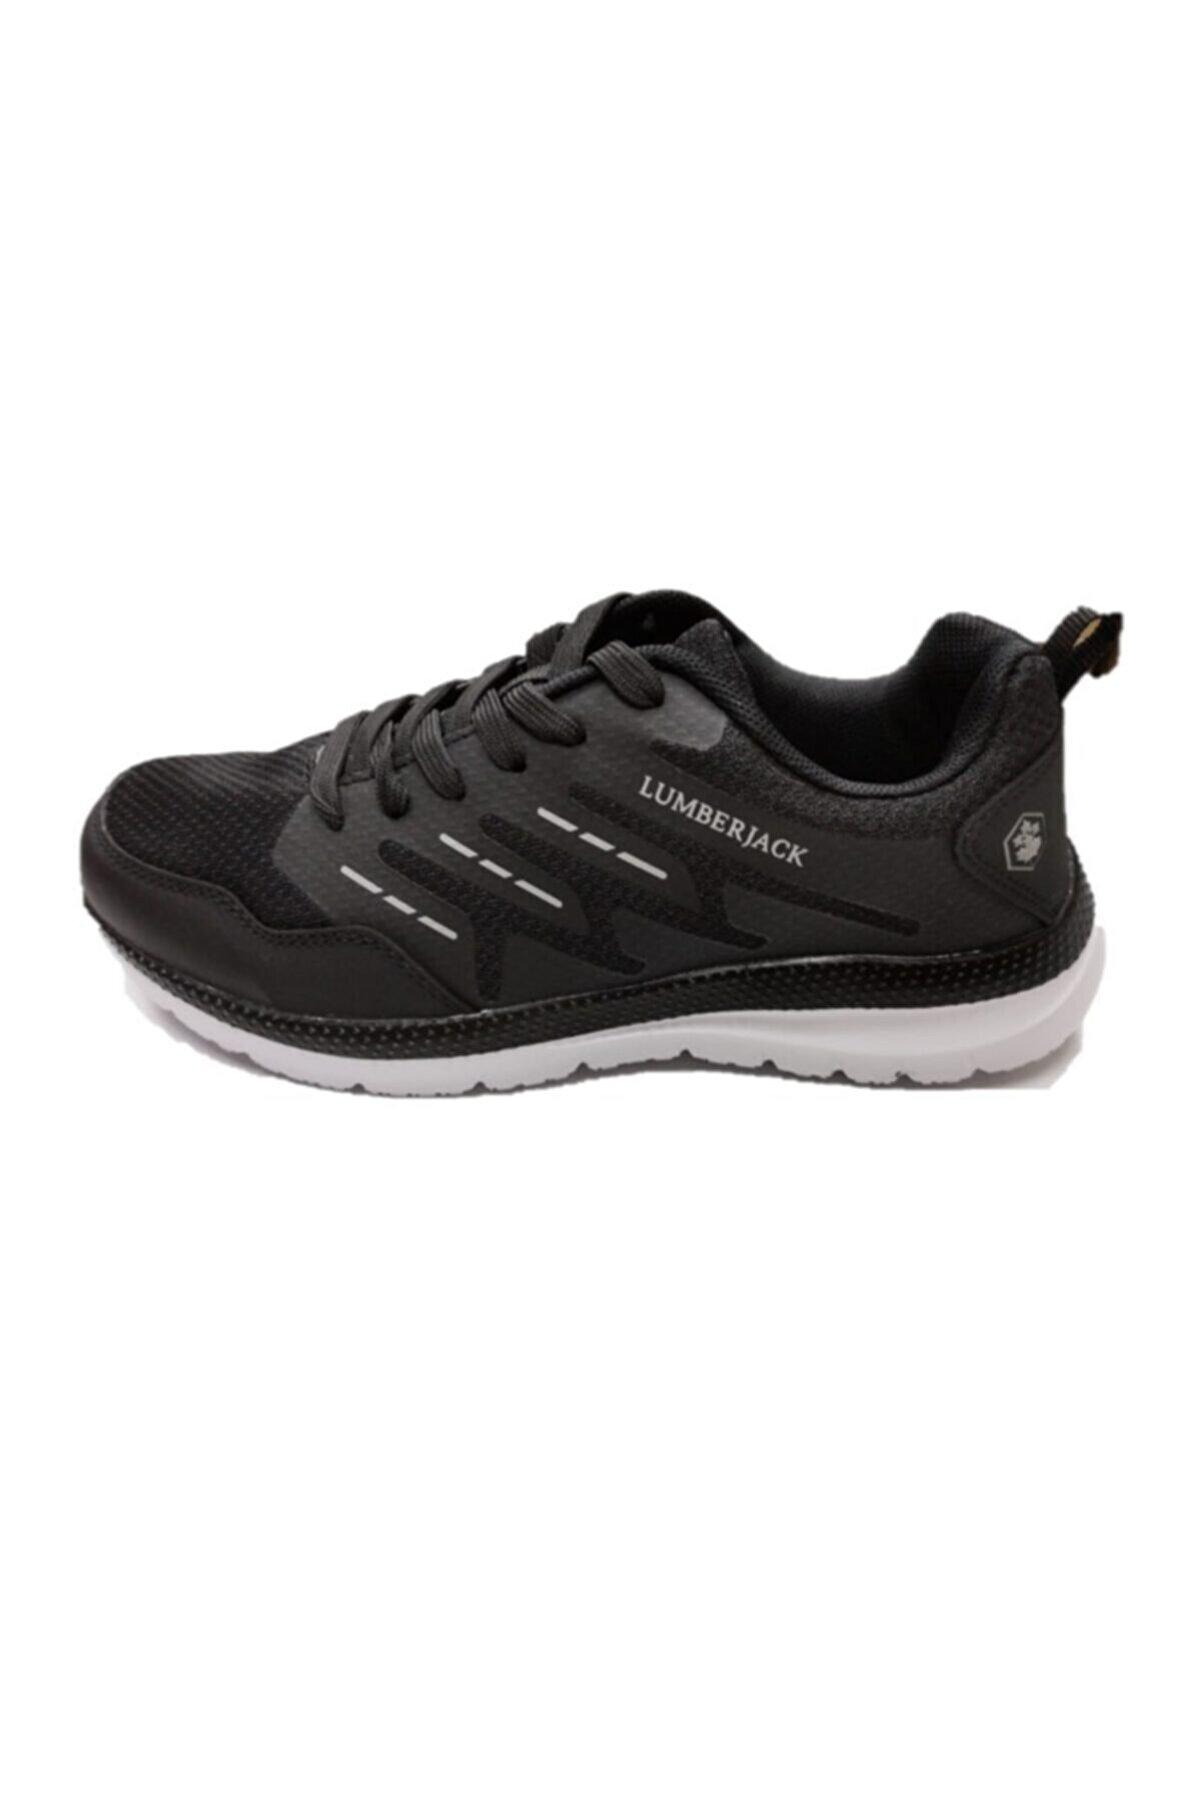 Lumberjack Unisex Memory Step Spor Ayakkabı